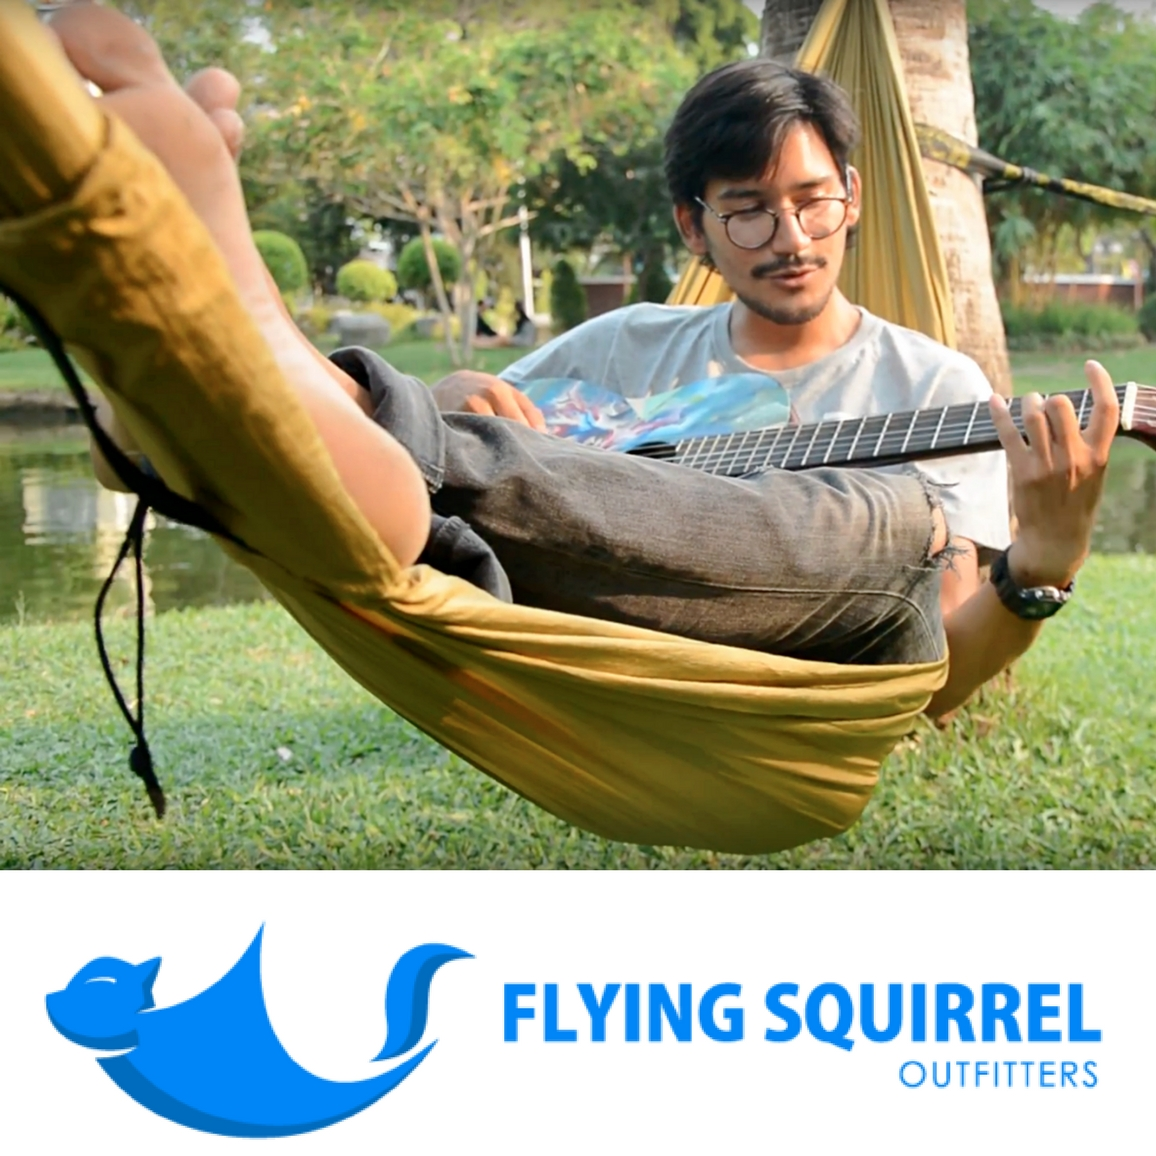 Flying Squirrel Brand image-2.jpg